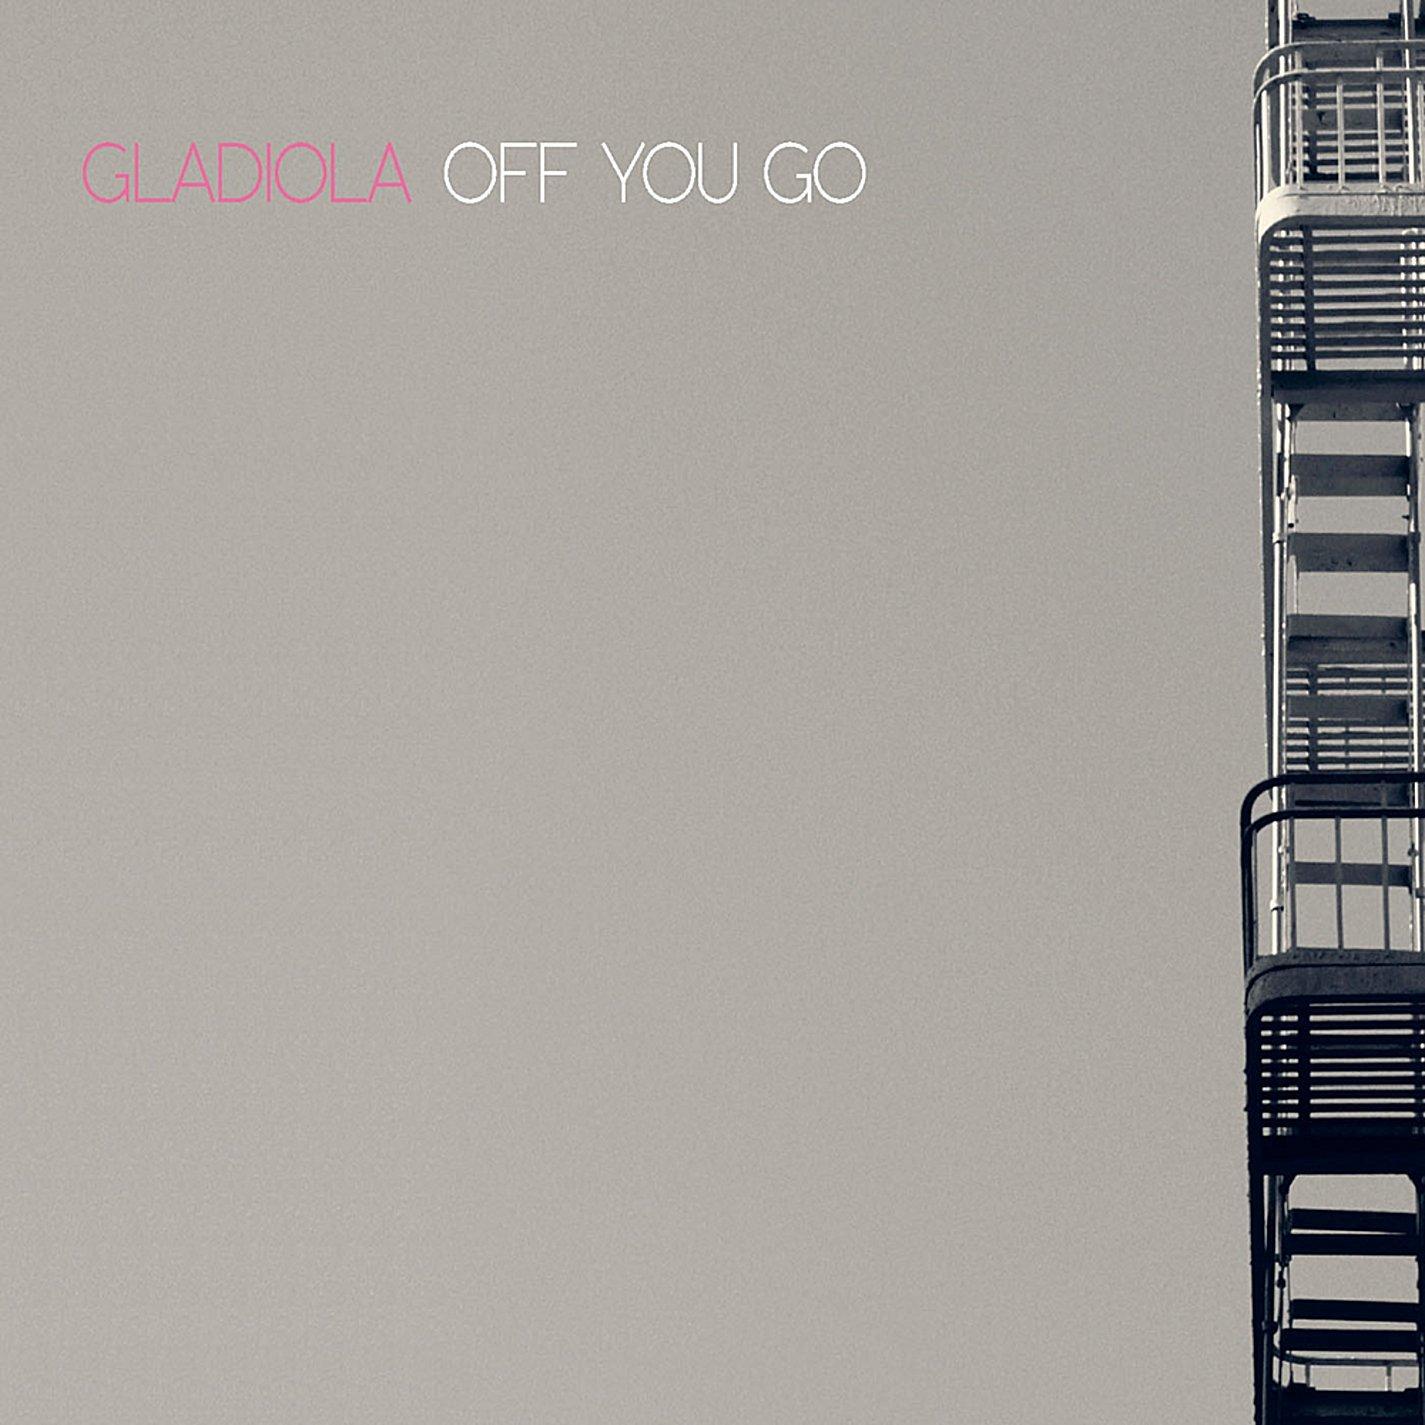 gladiola-off-you-go-cover